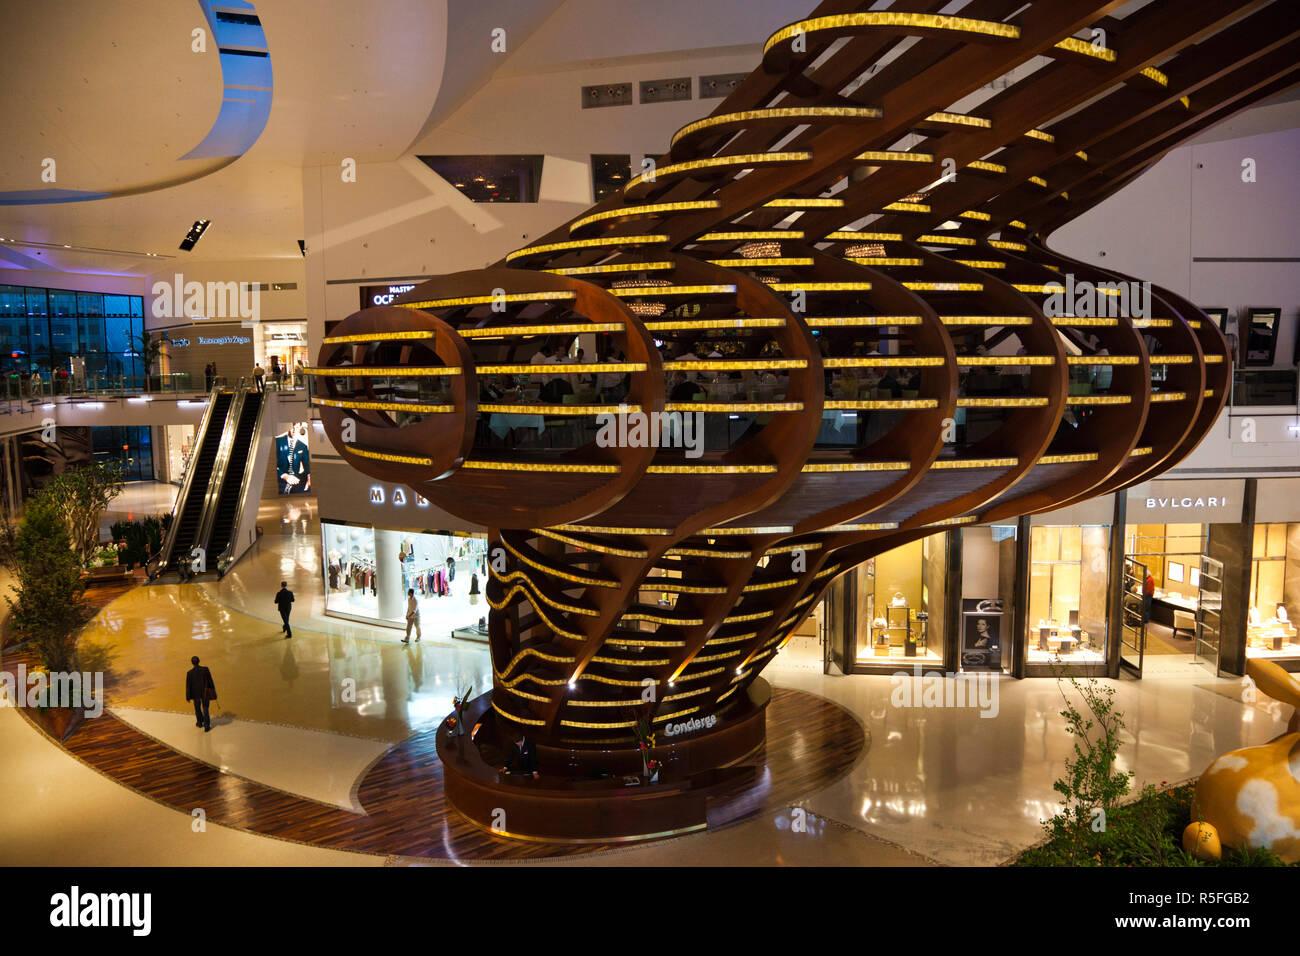 USA, Nevada, Las Vegas, CityCenter, Crystals Luxury Mall, interior - Stock Image